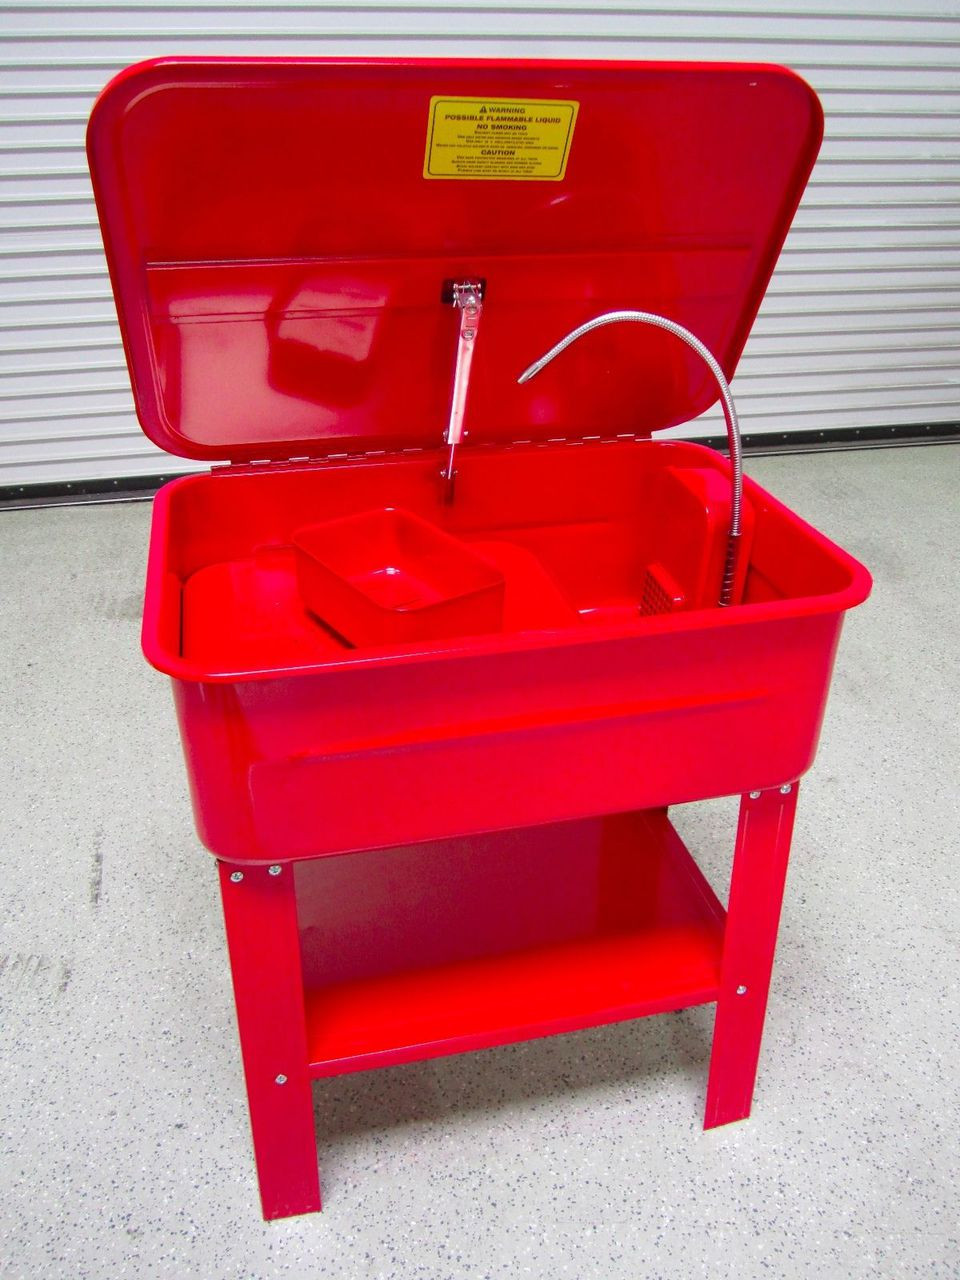 20 Gallon Automotive Parts Washer